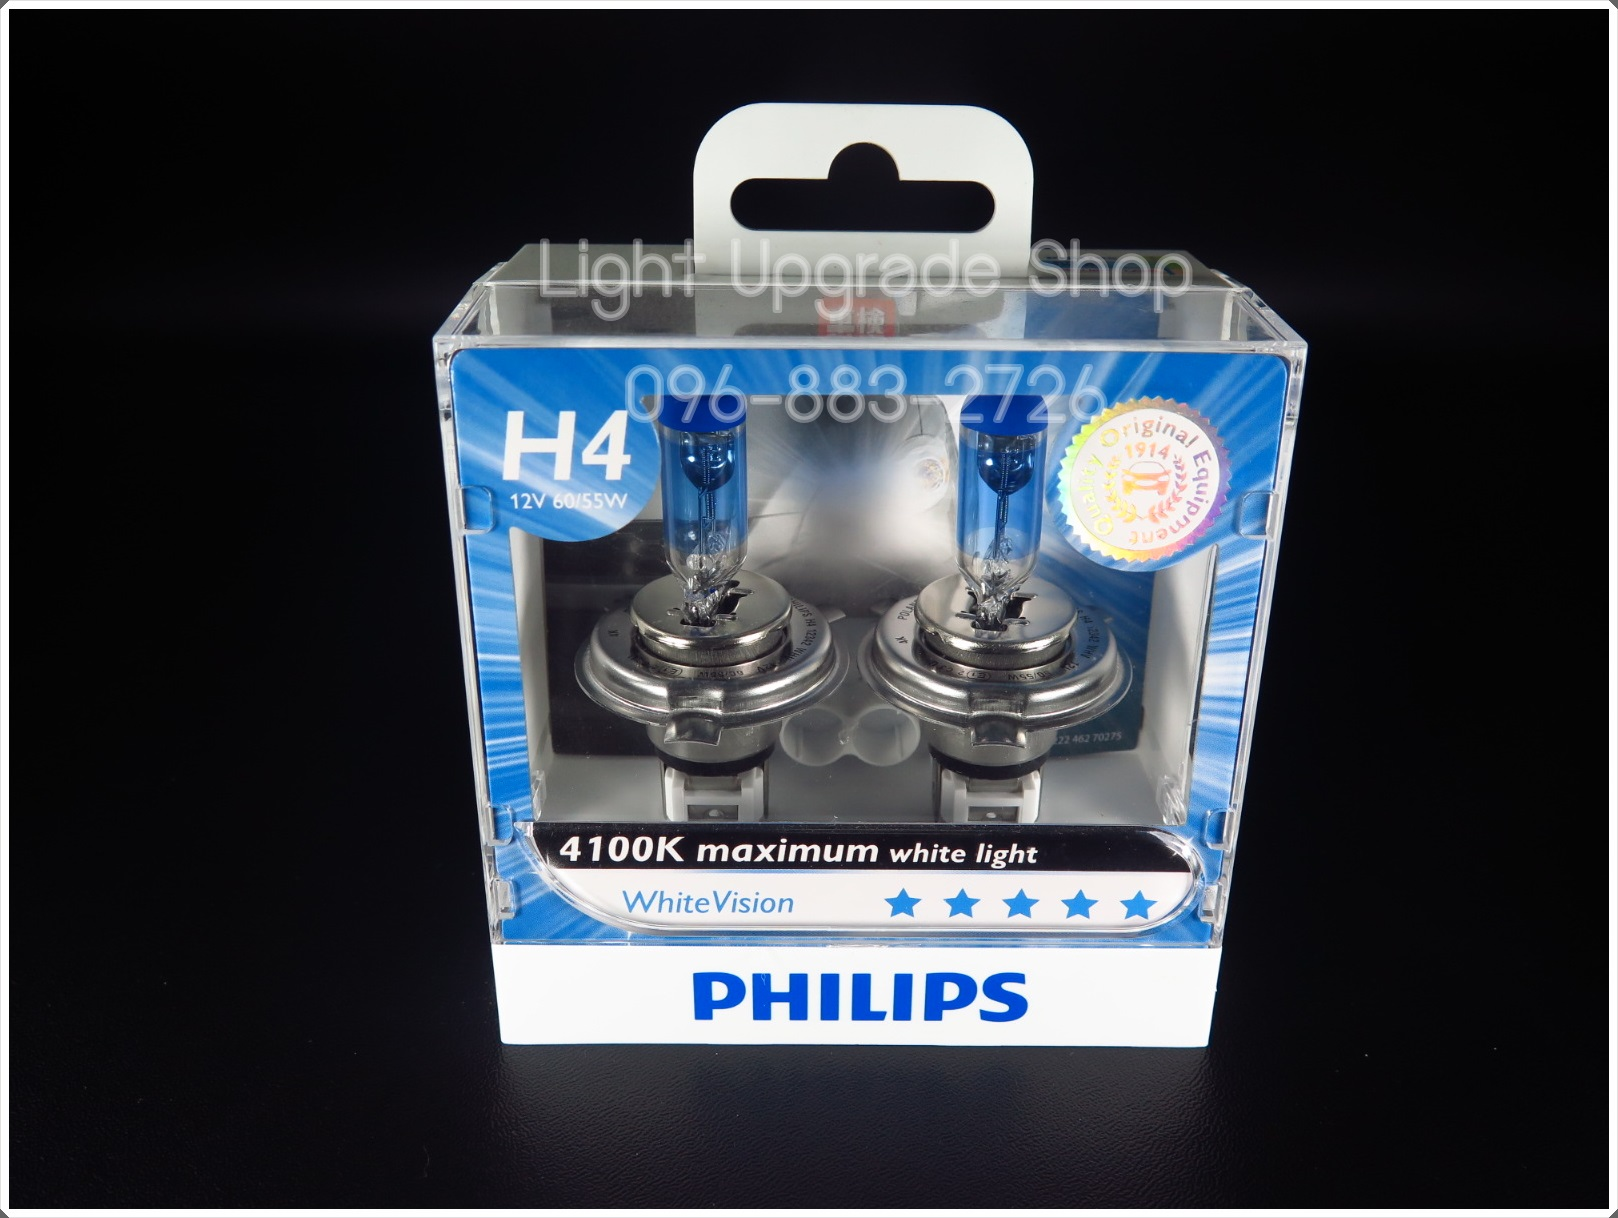 Philips White Vision 4100K [H4]